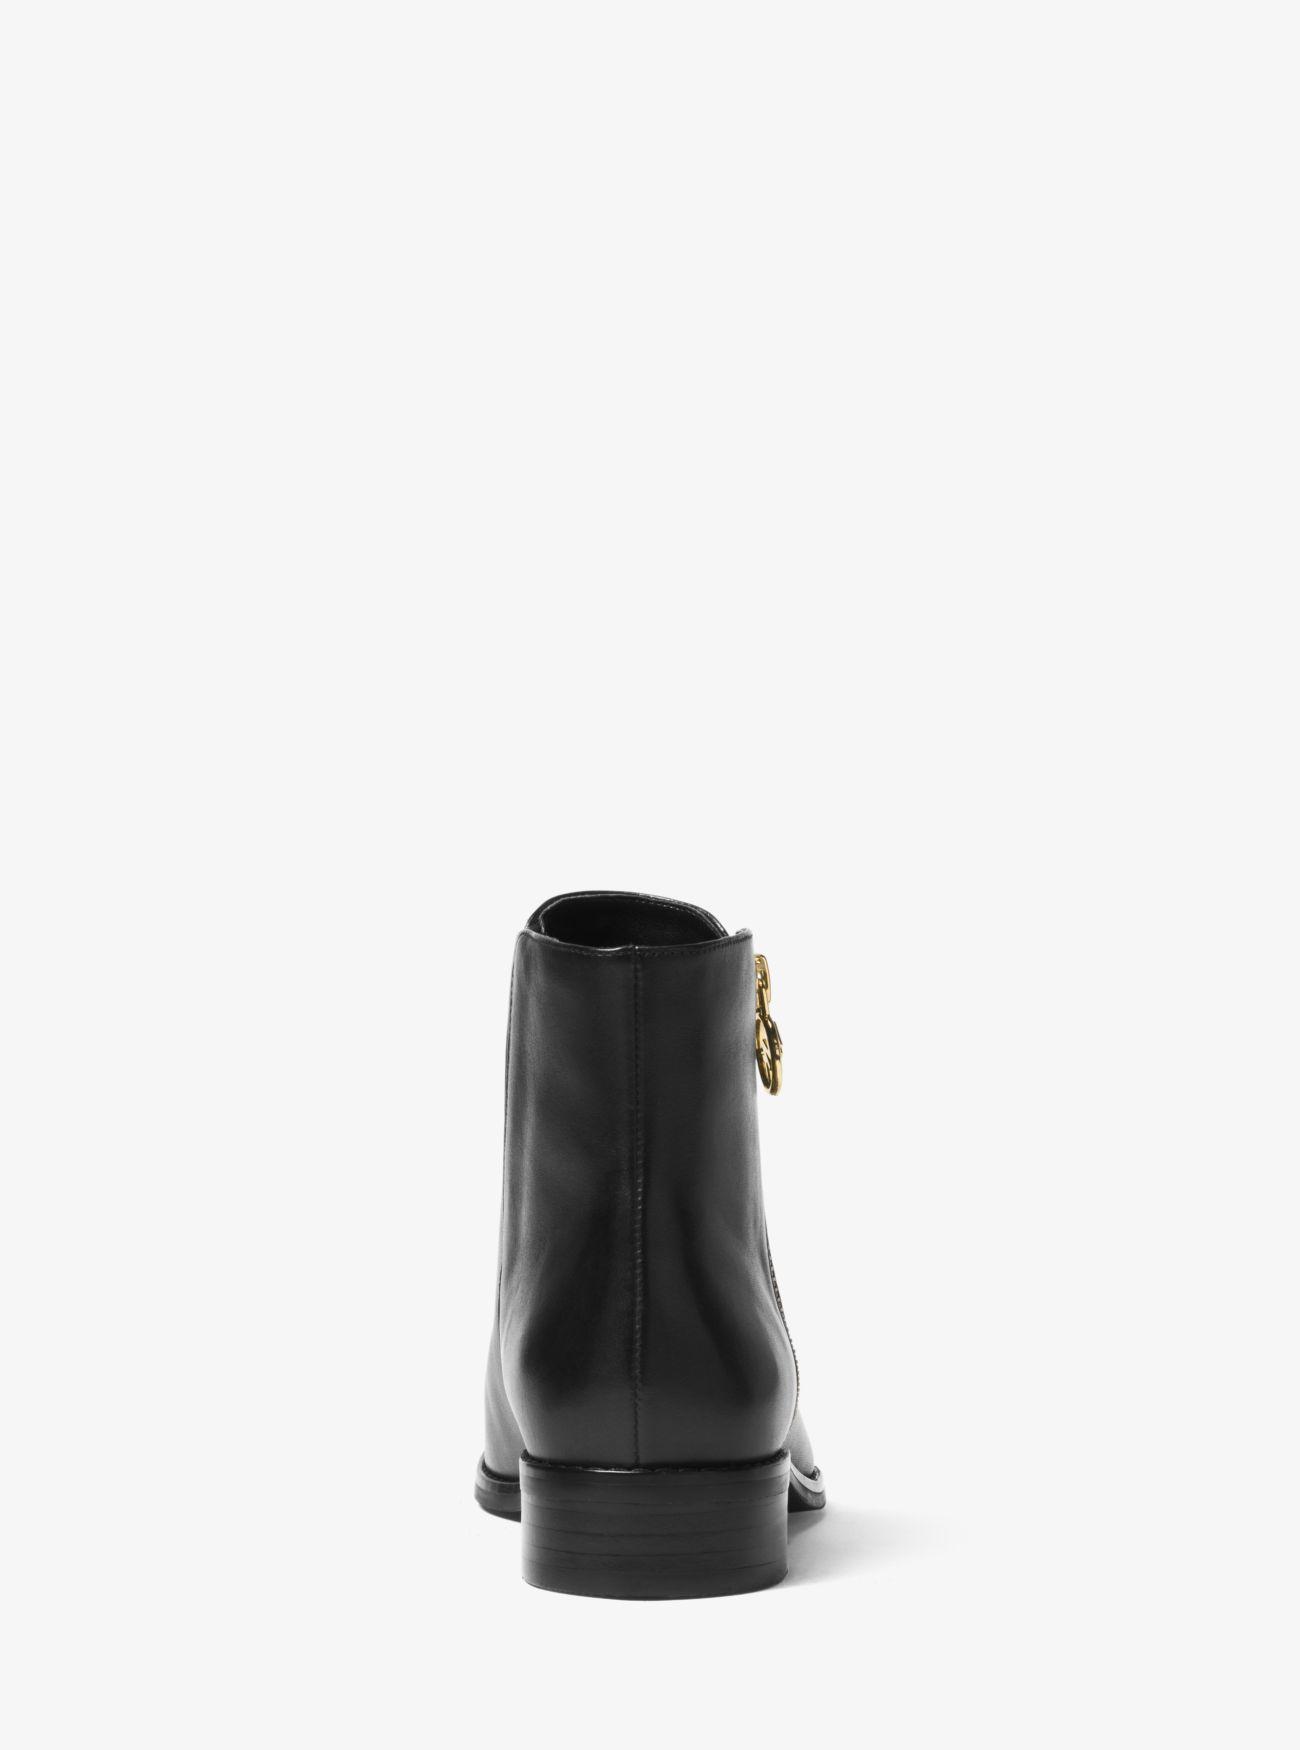 6f02b1d26d43 ... Jaycie Leather Ankle Boot. MICHAEL Michael Kors